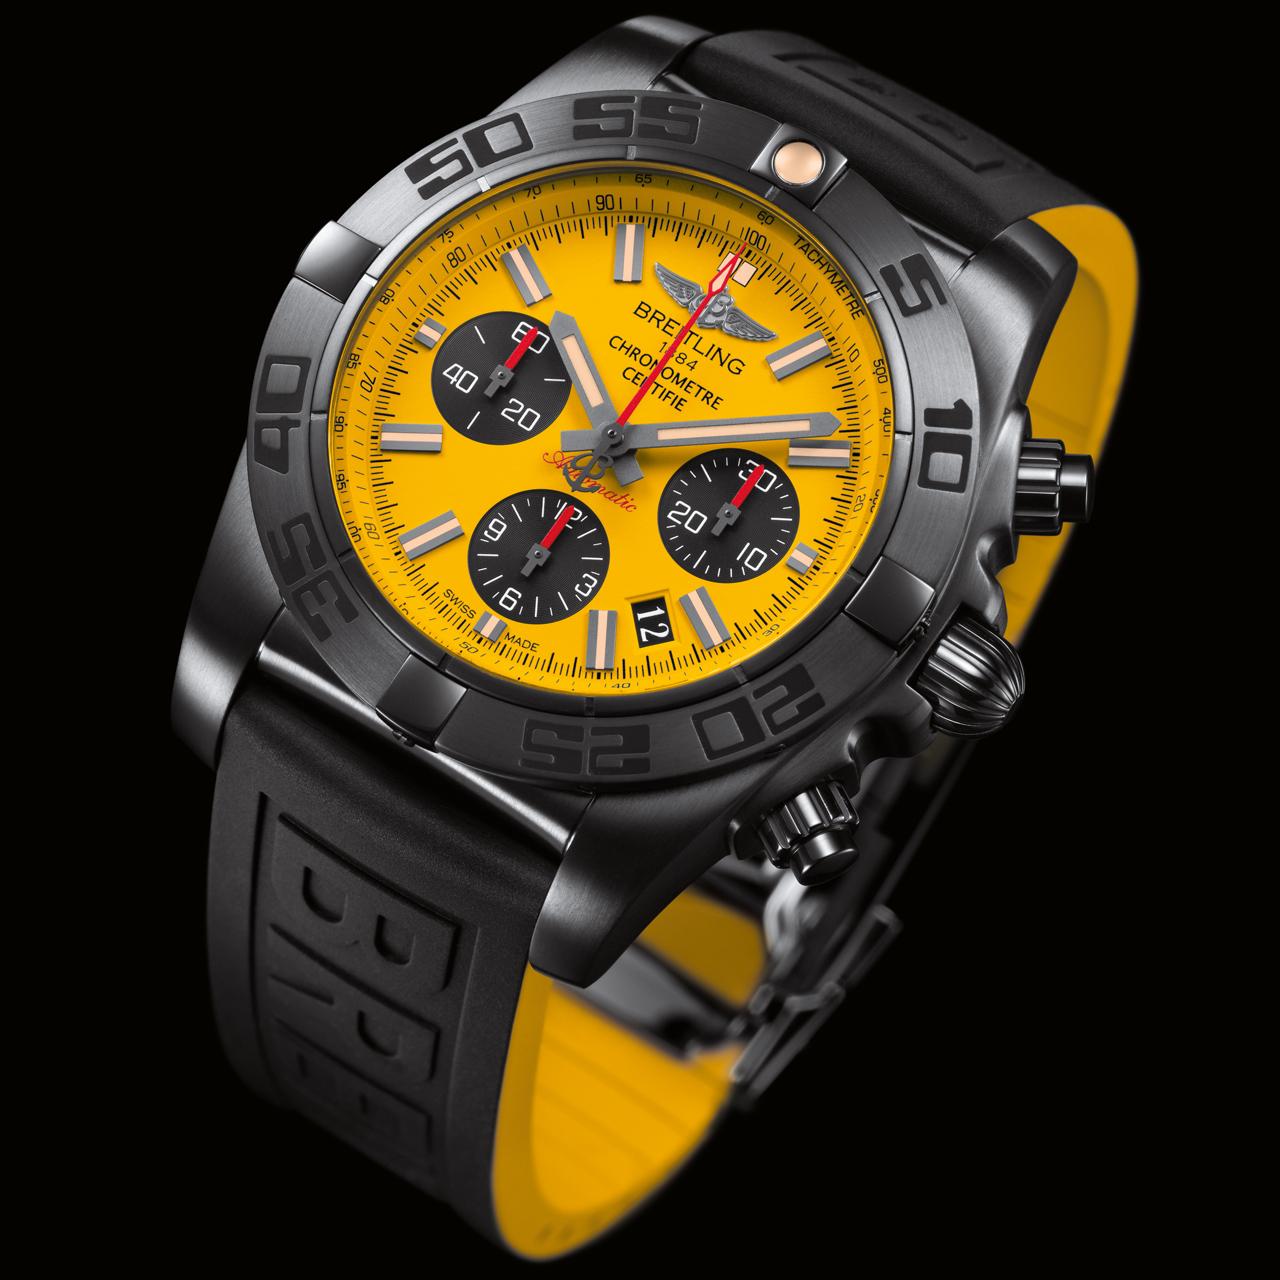 breitling chronomat 44 blacksteel special edition your watch hub. Black Bedroom Furniture Sets. Home Design Ideas